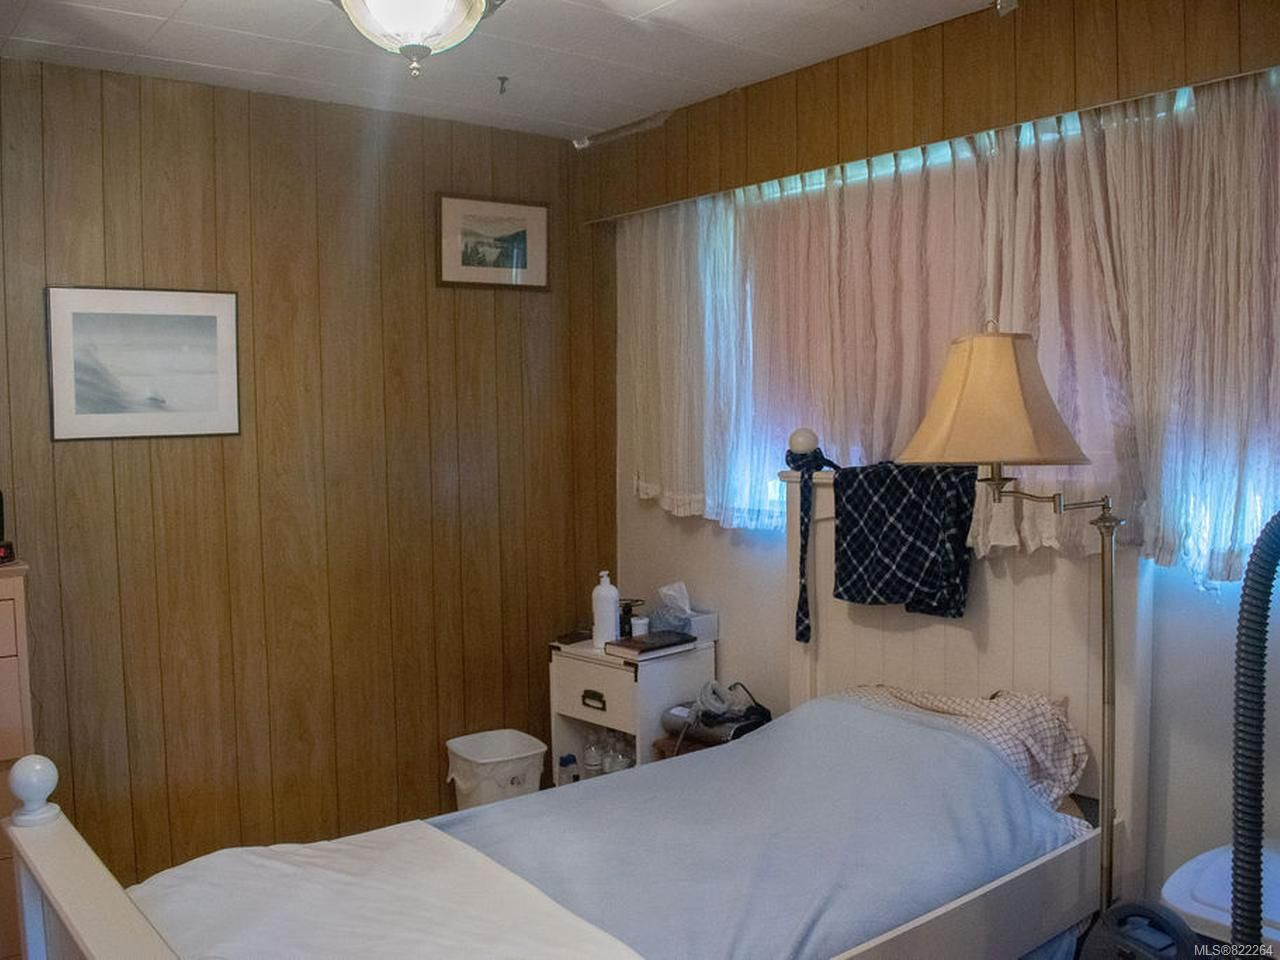 Photo 14: Photos: 4150 Rex Rd in PORT ALBERNI: PA Port Alberni House for sale (Port Alberni)  : MLS®# 822264